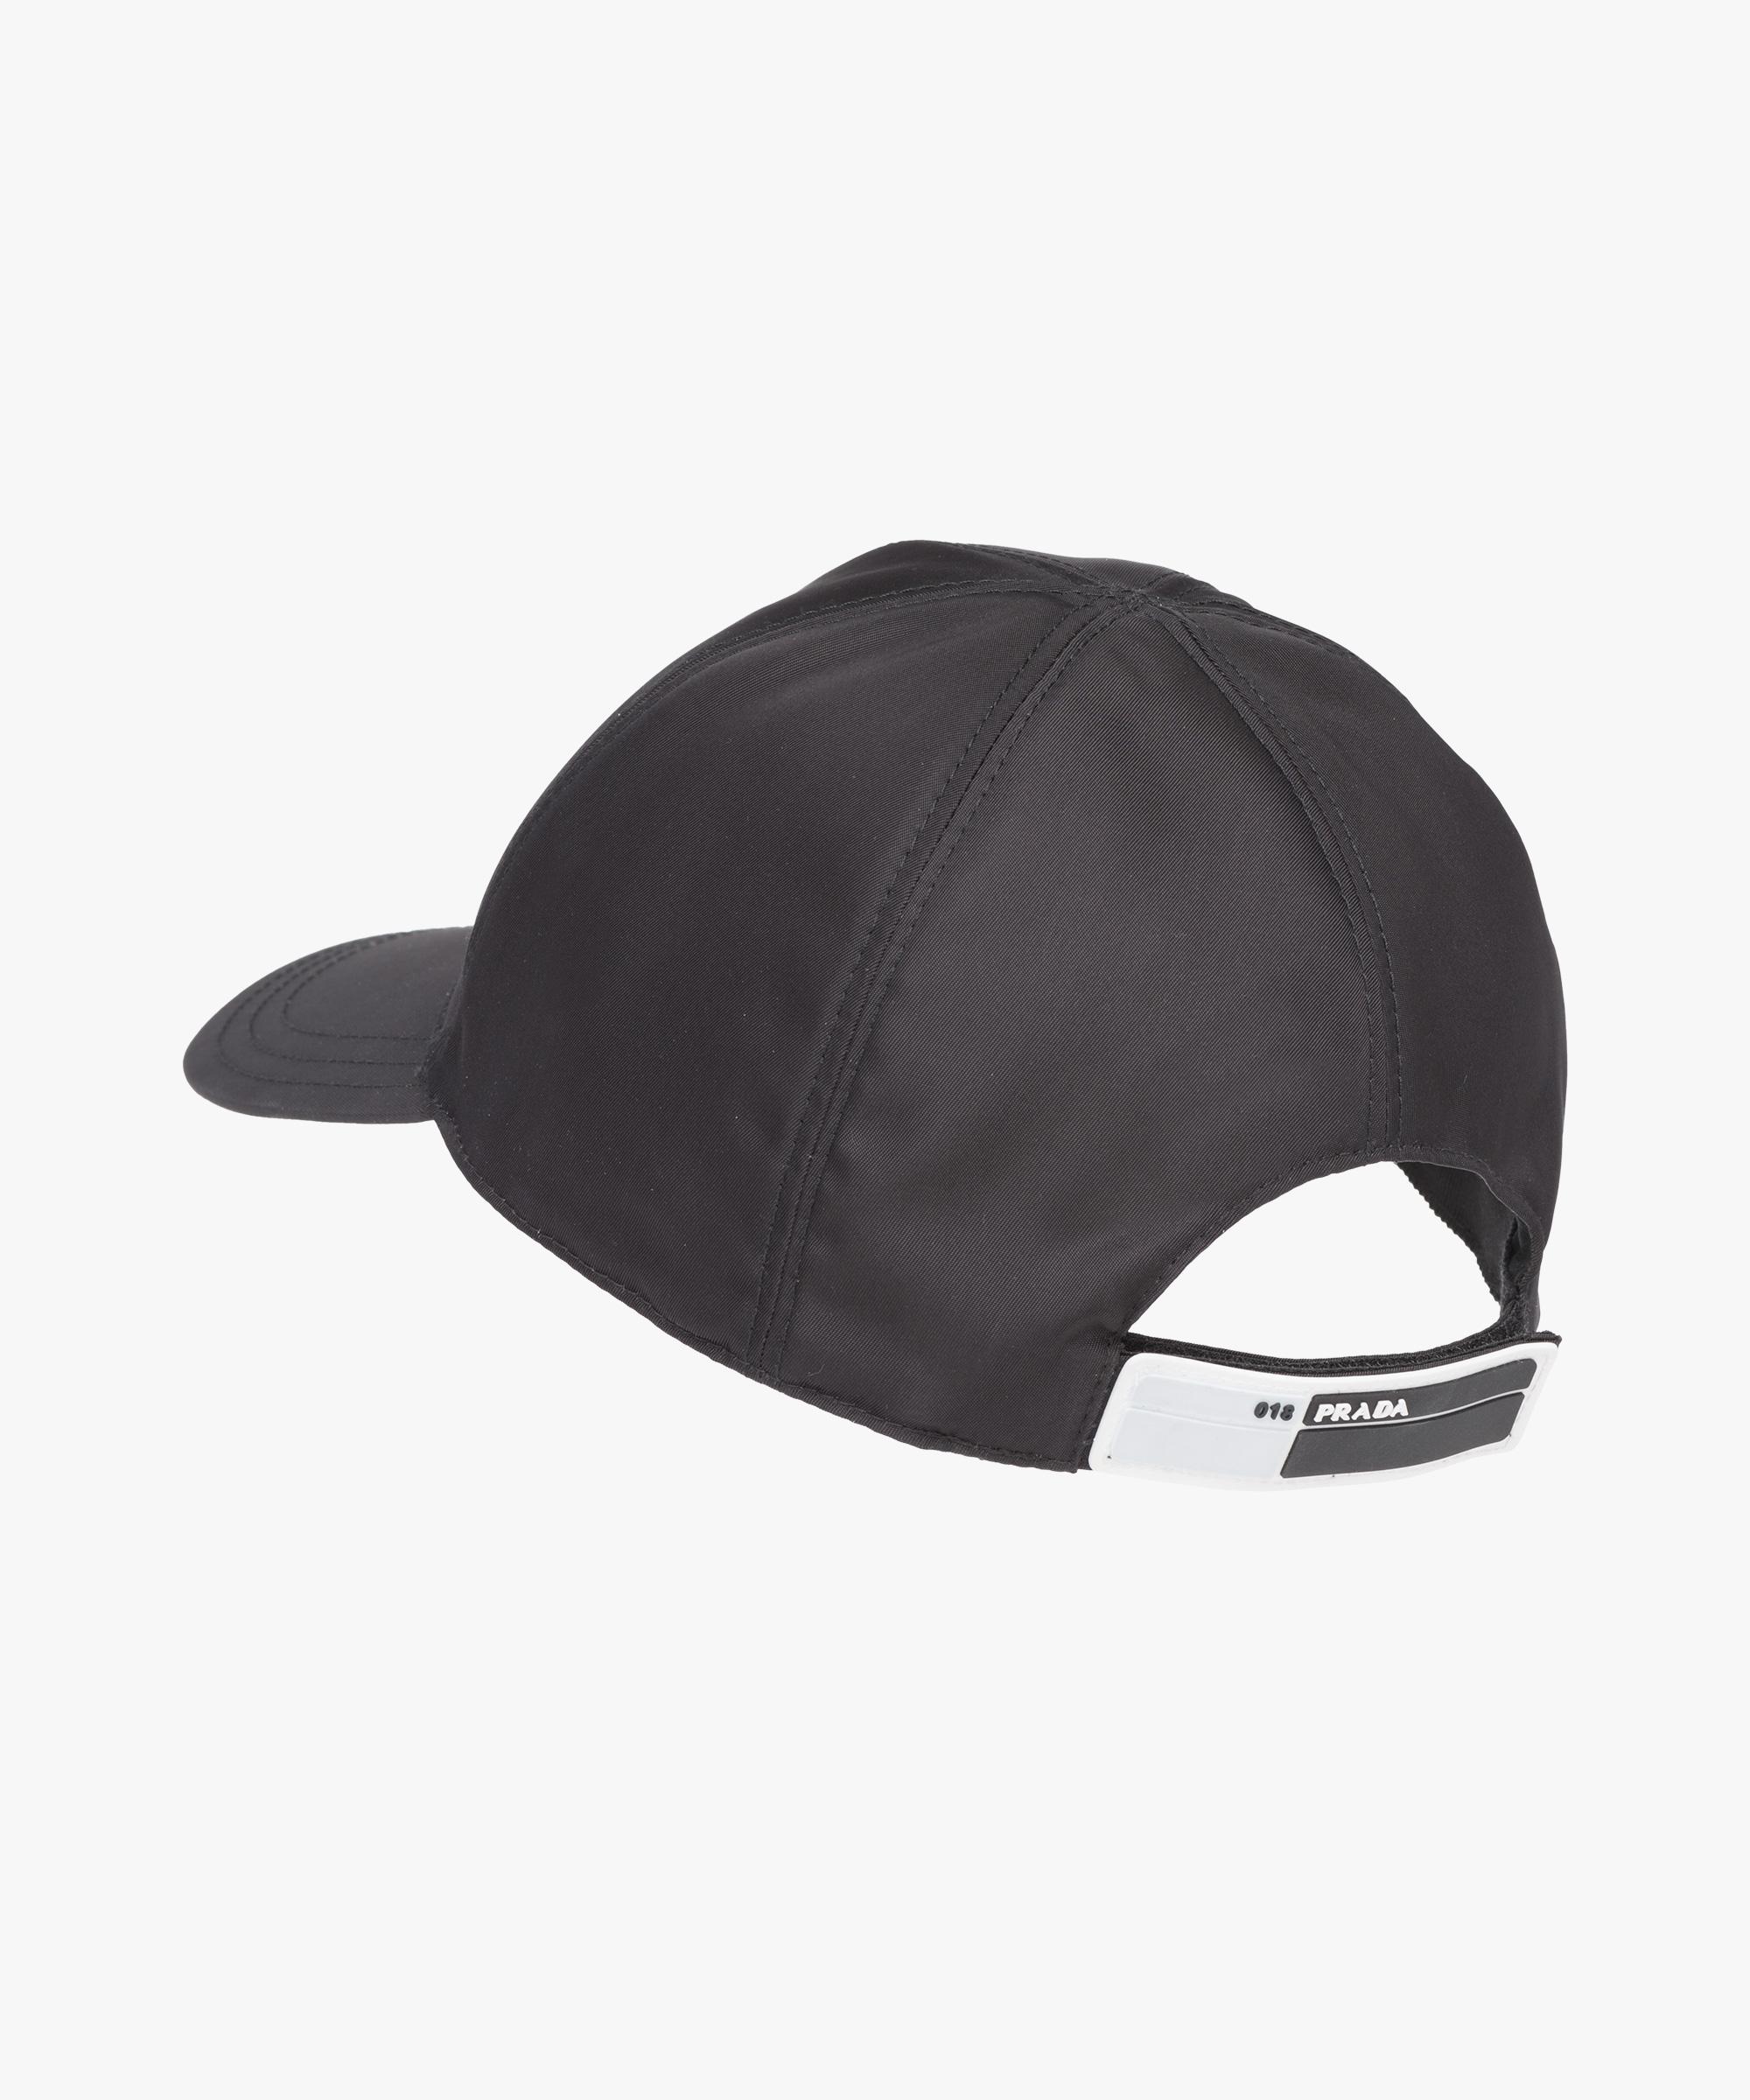 ... Nylon baseball cap Prada BLACK ... 0b194b96cf9